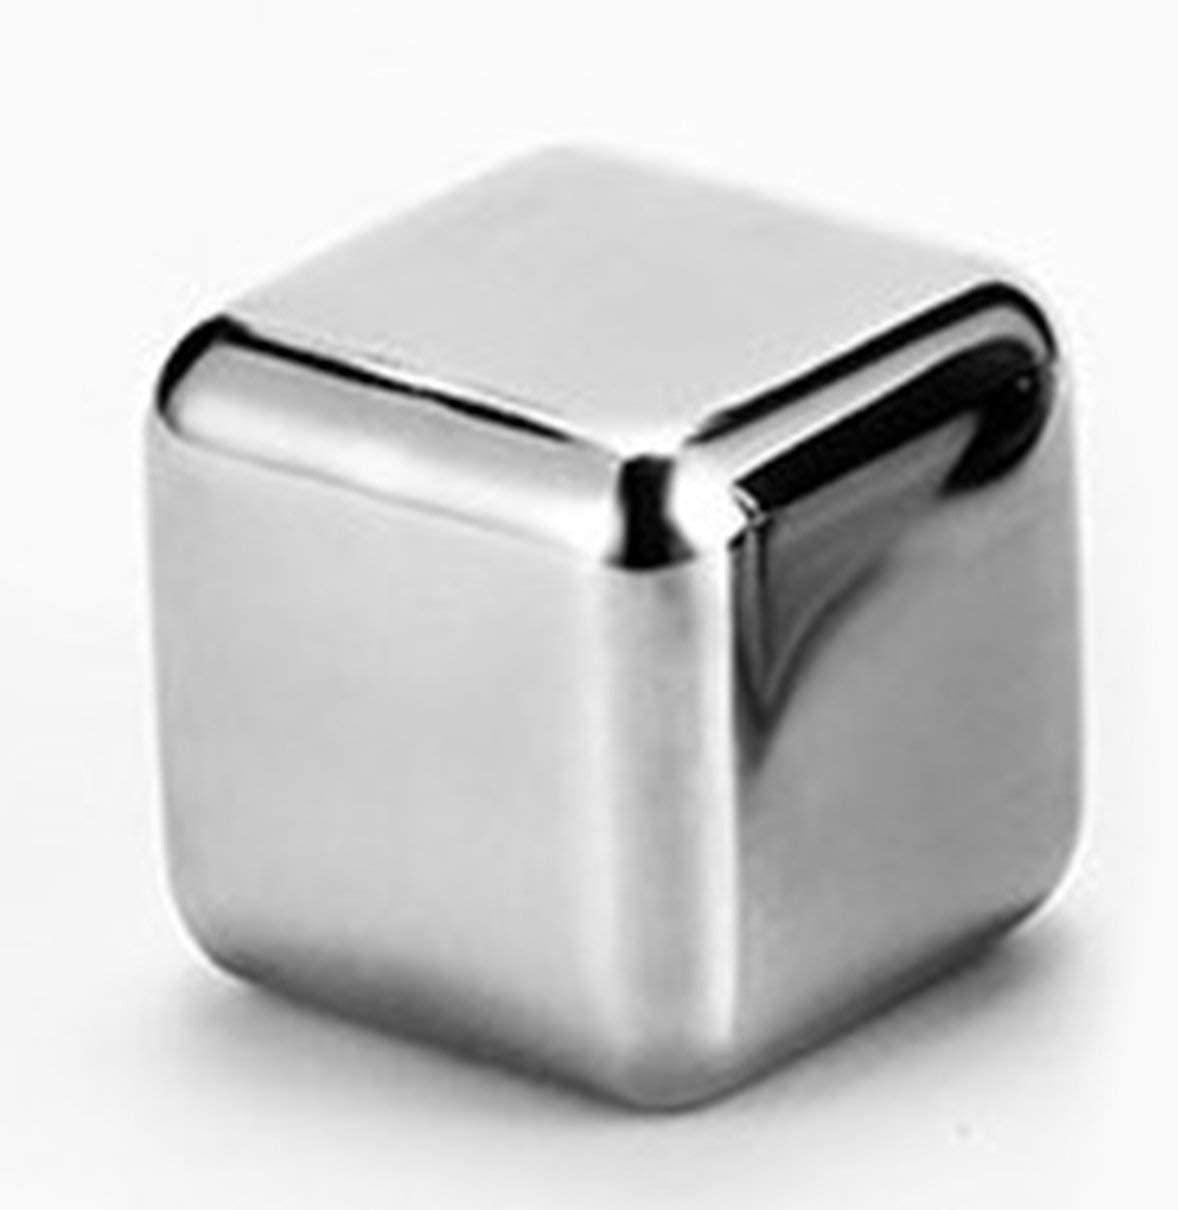 Kaczmarek 1pcs Cube Whiskey Stones 27mm 304 Stainless Steel Rock Wine Taste Beer Ice Stone Bar